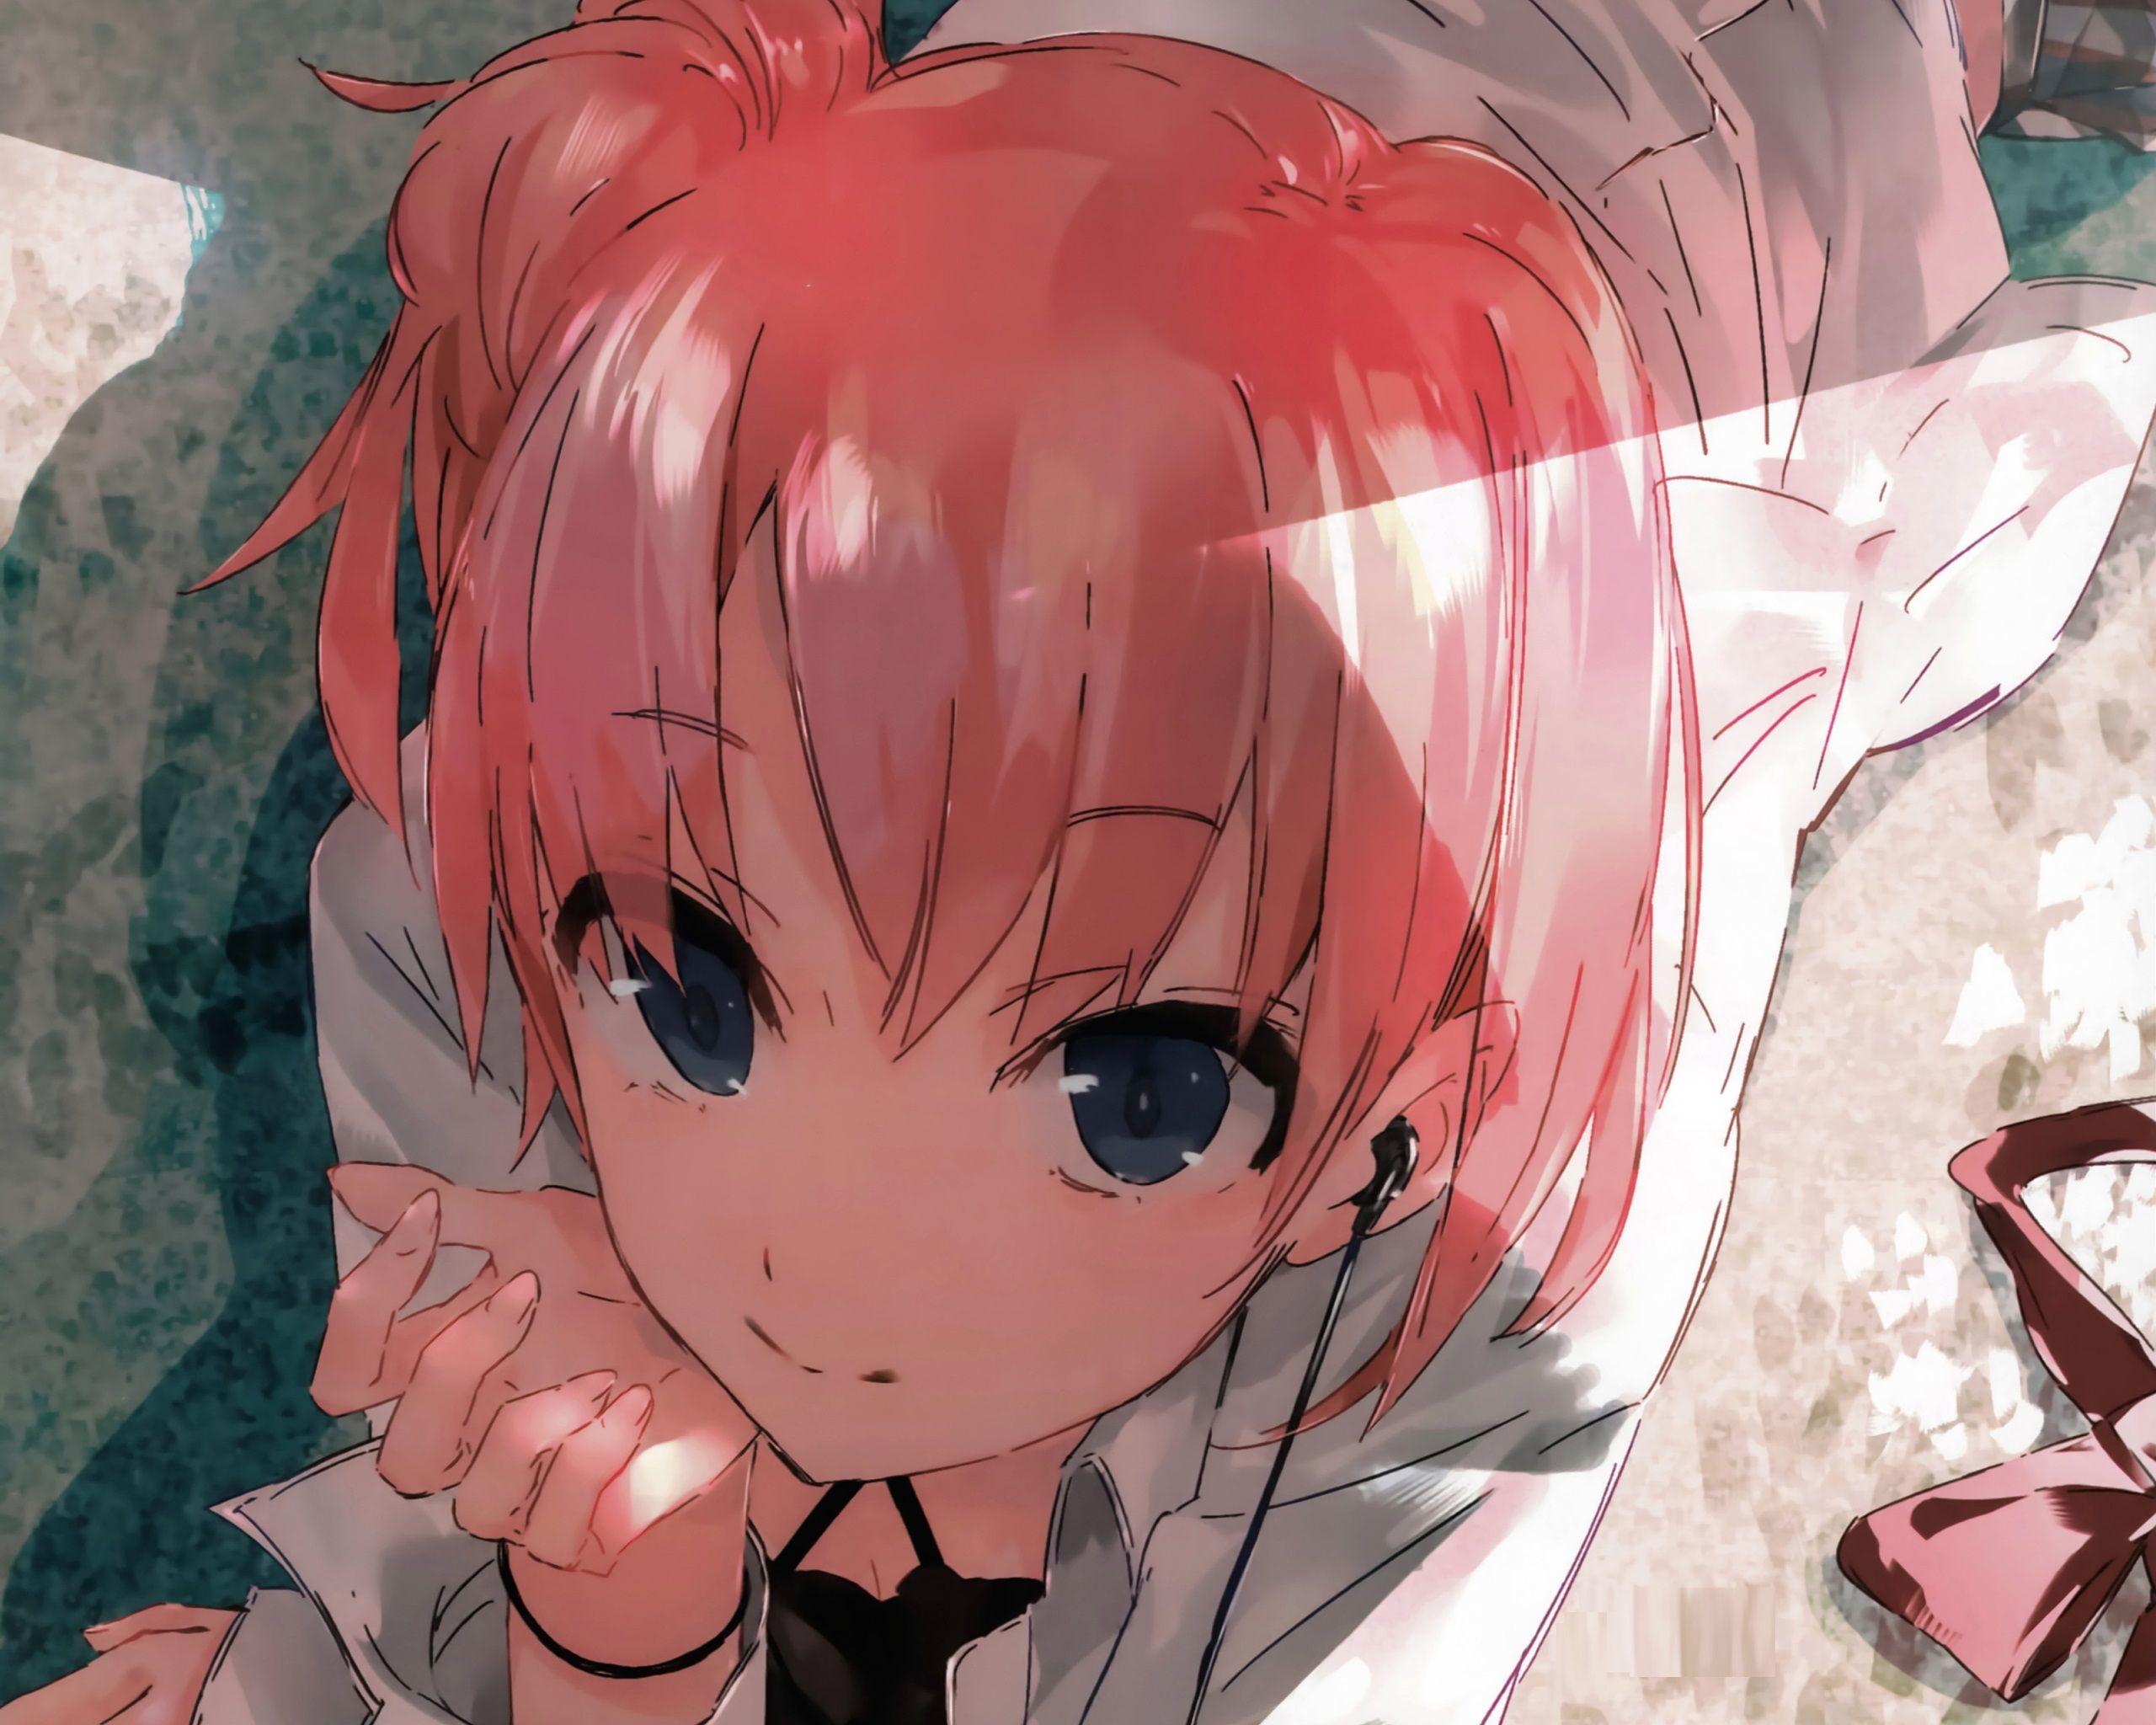 Oregairu Yui Yuigahama Illustrazioni, Disegno manga